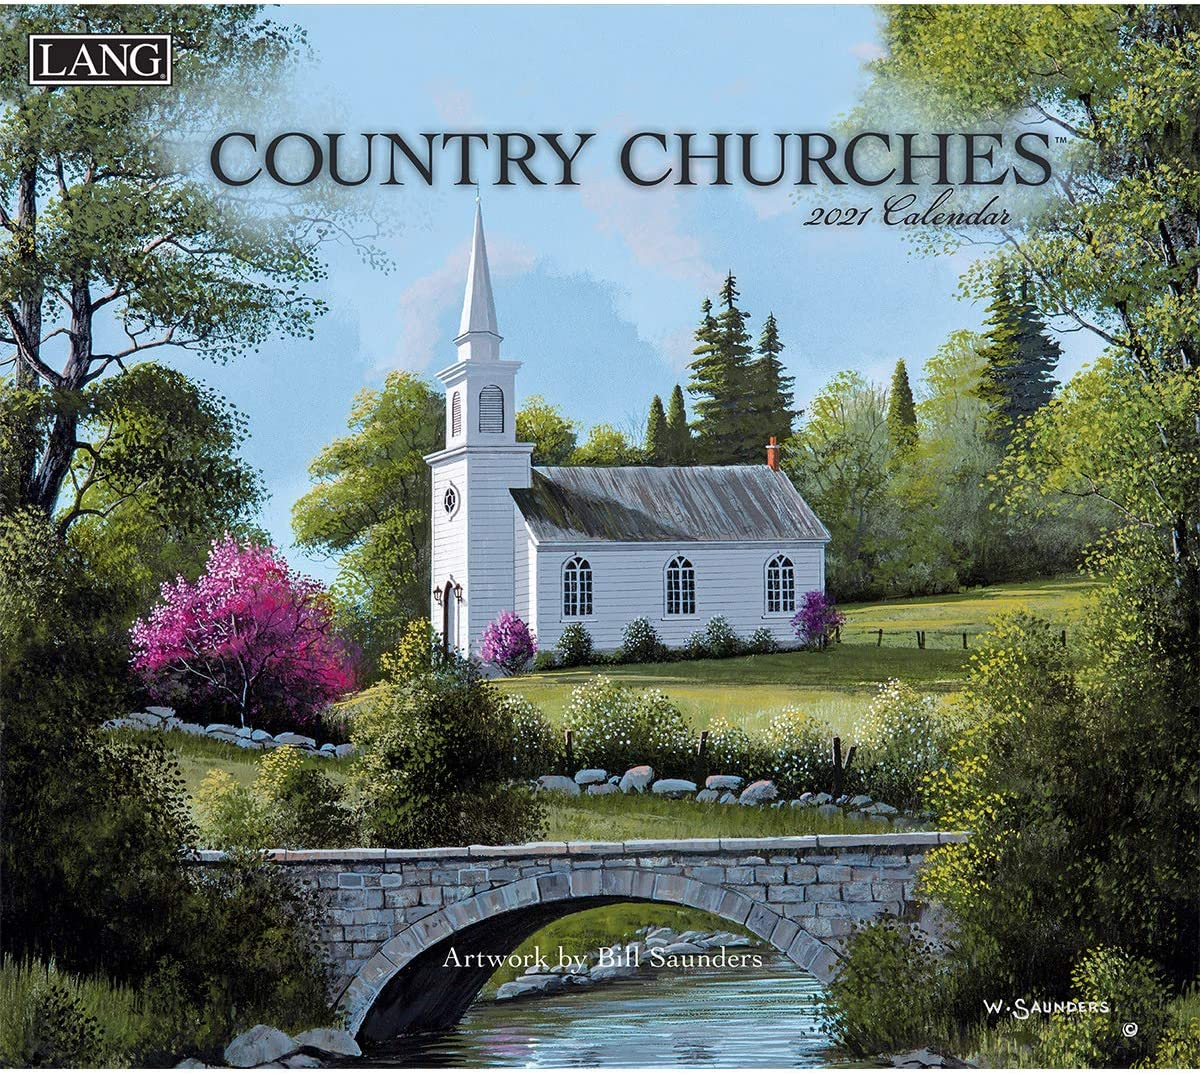 Lang Country Churches 2021 Wall Calendar (21991001904)